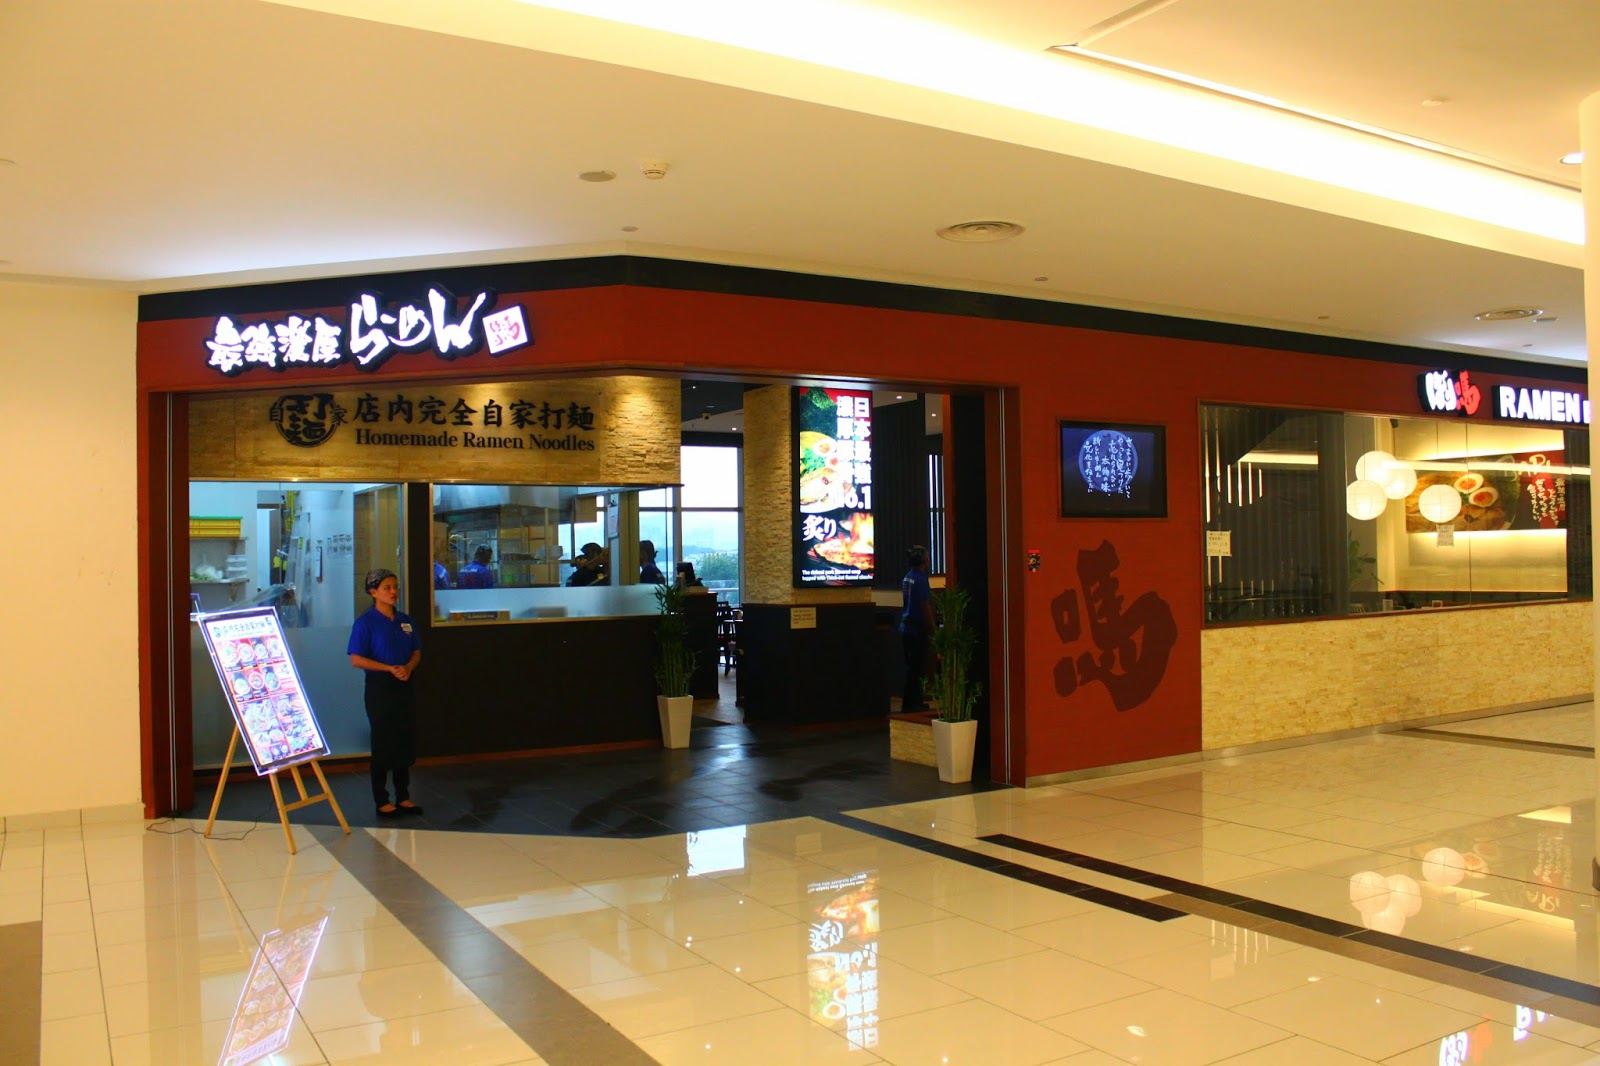 Bari-uma Ramen @ Jaya Shopping Center - f i n d i n g // f ...